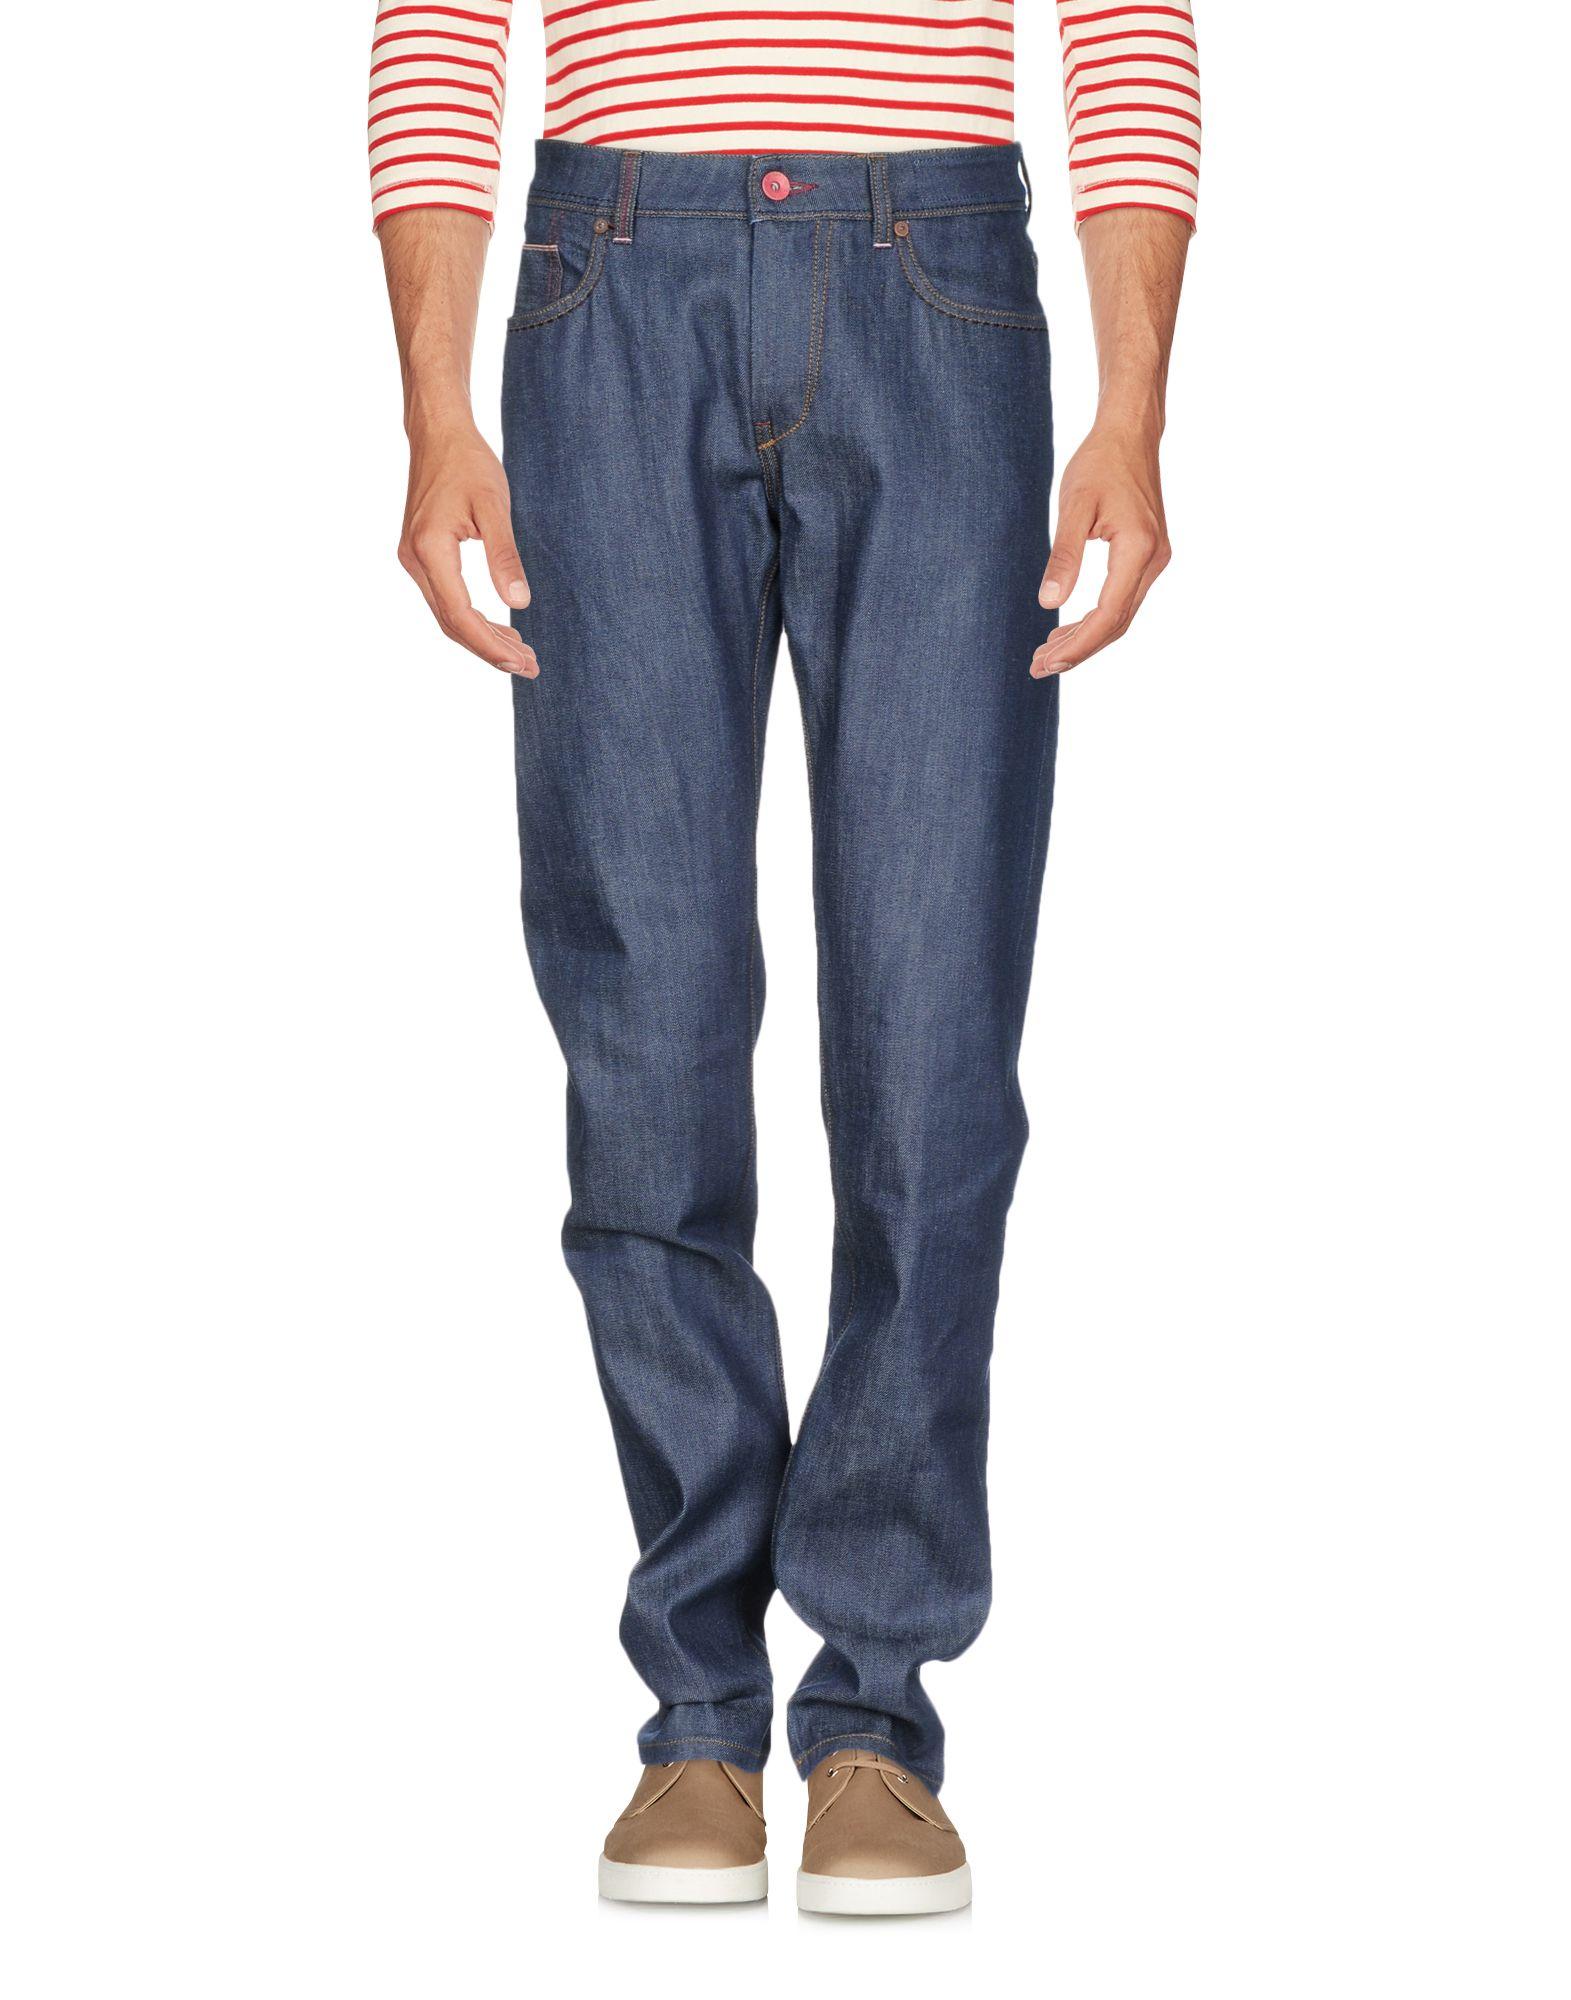 Pantaloni Jeans Re-Hash Uomo - Acquista online su